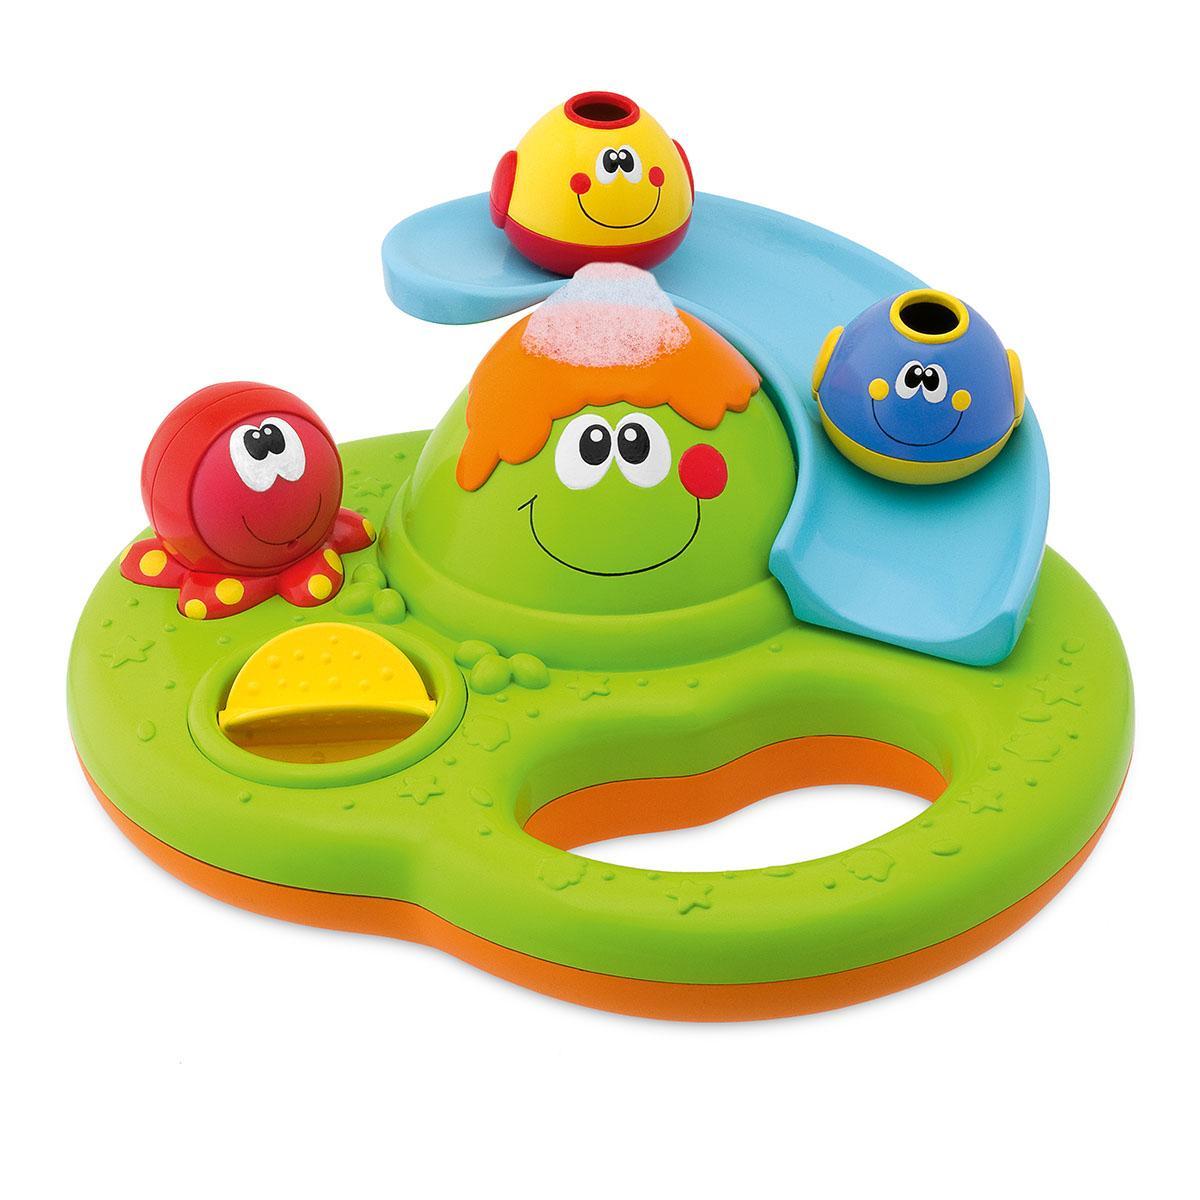 Игрушка для ванны Остров ГавайиИгрушки для ванны<br><br><br>Артикул: 10CO1275<br>Бренд: Chicco